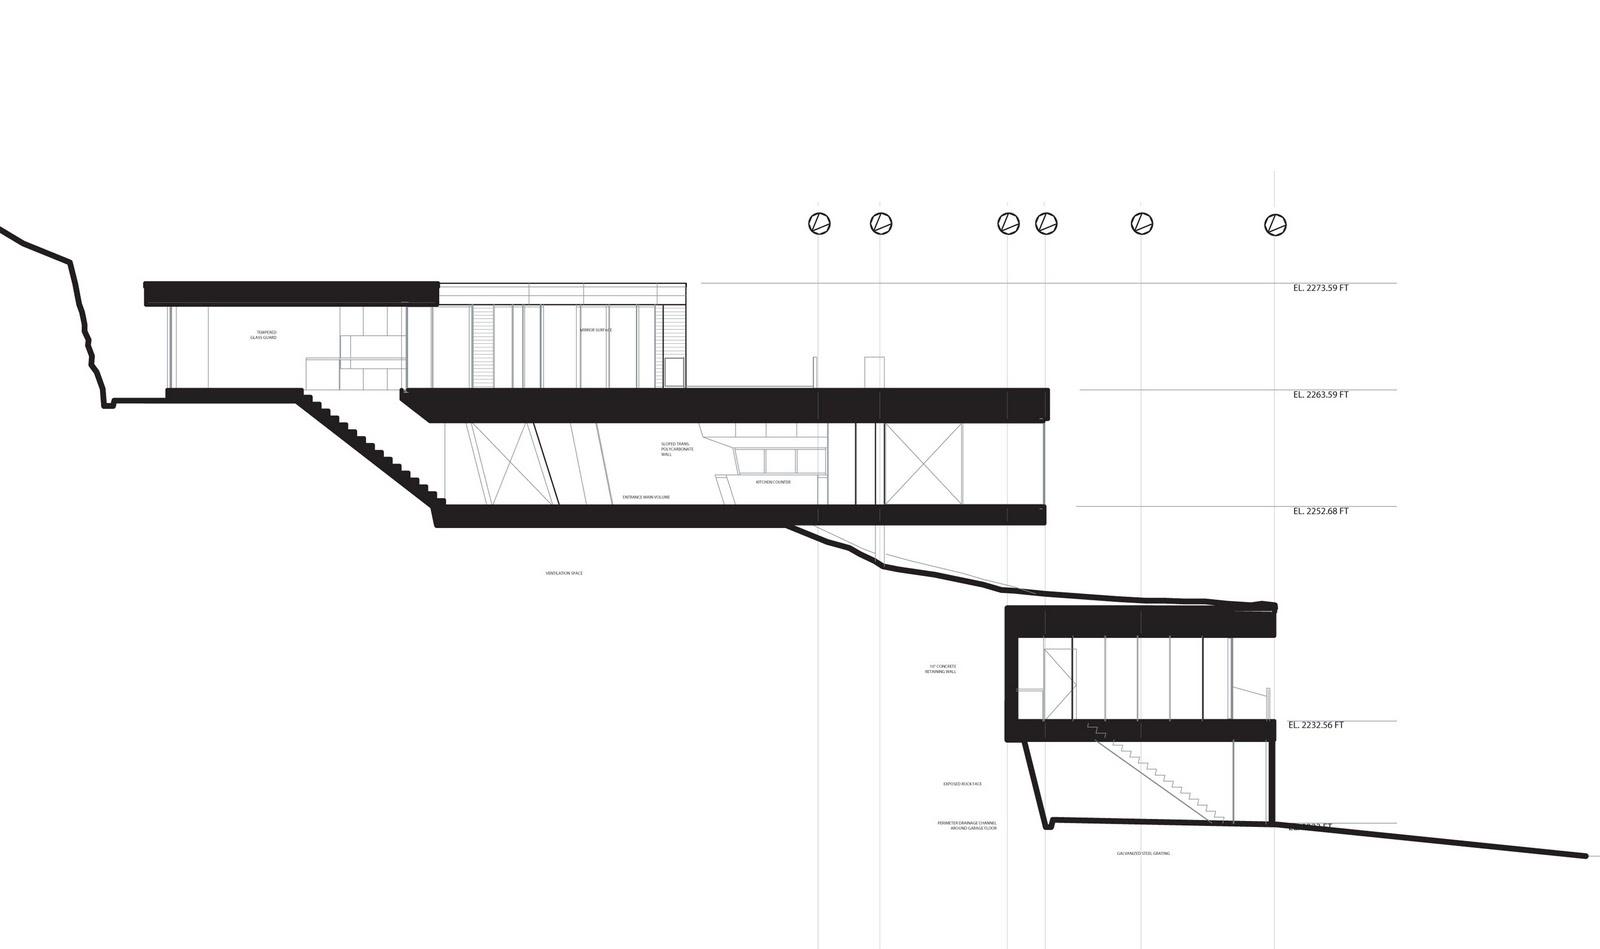 Modern slope house design beautiful homes blog for Steep slope house design ideas